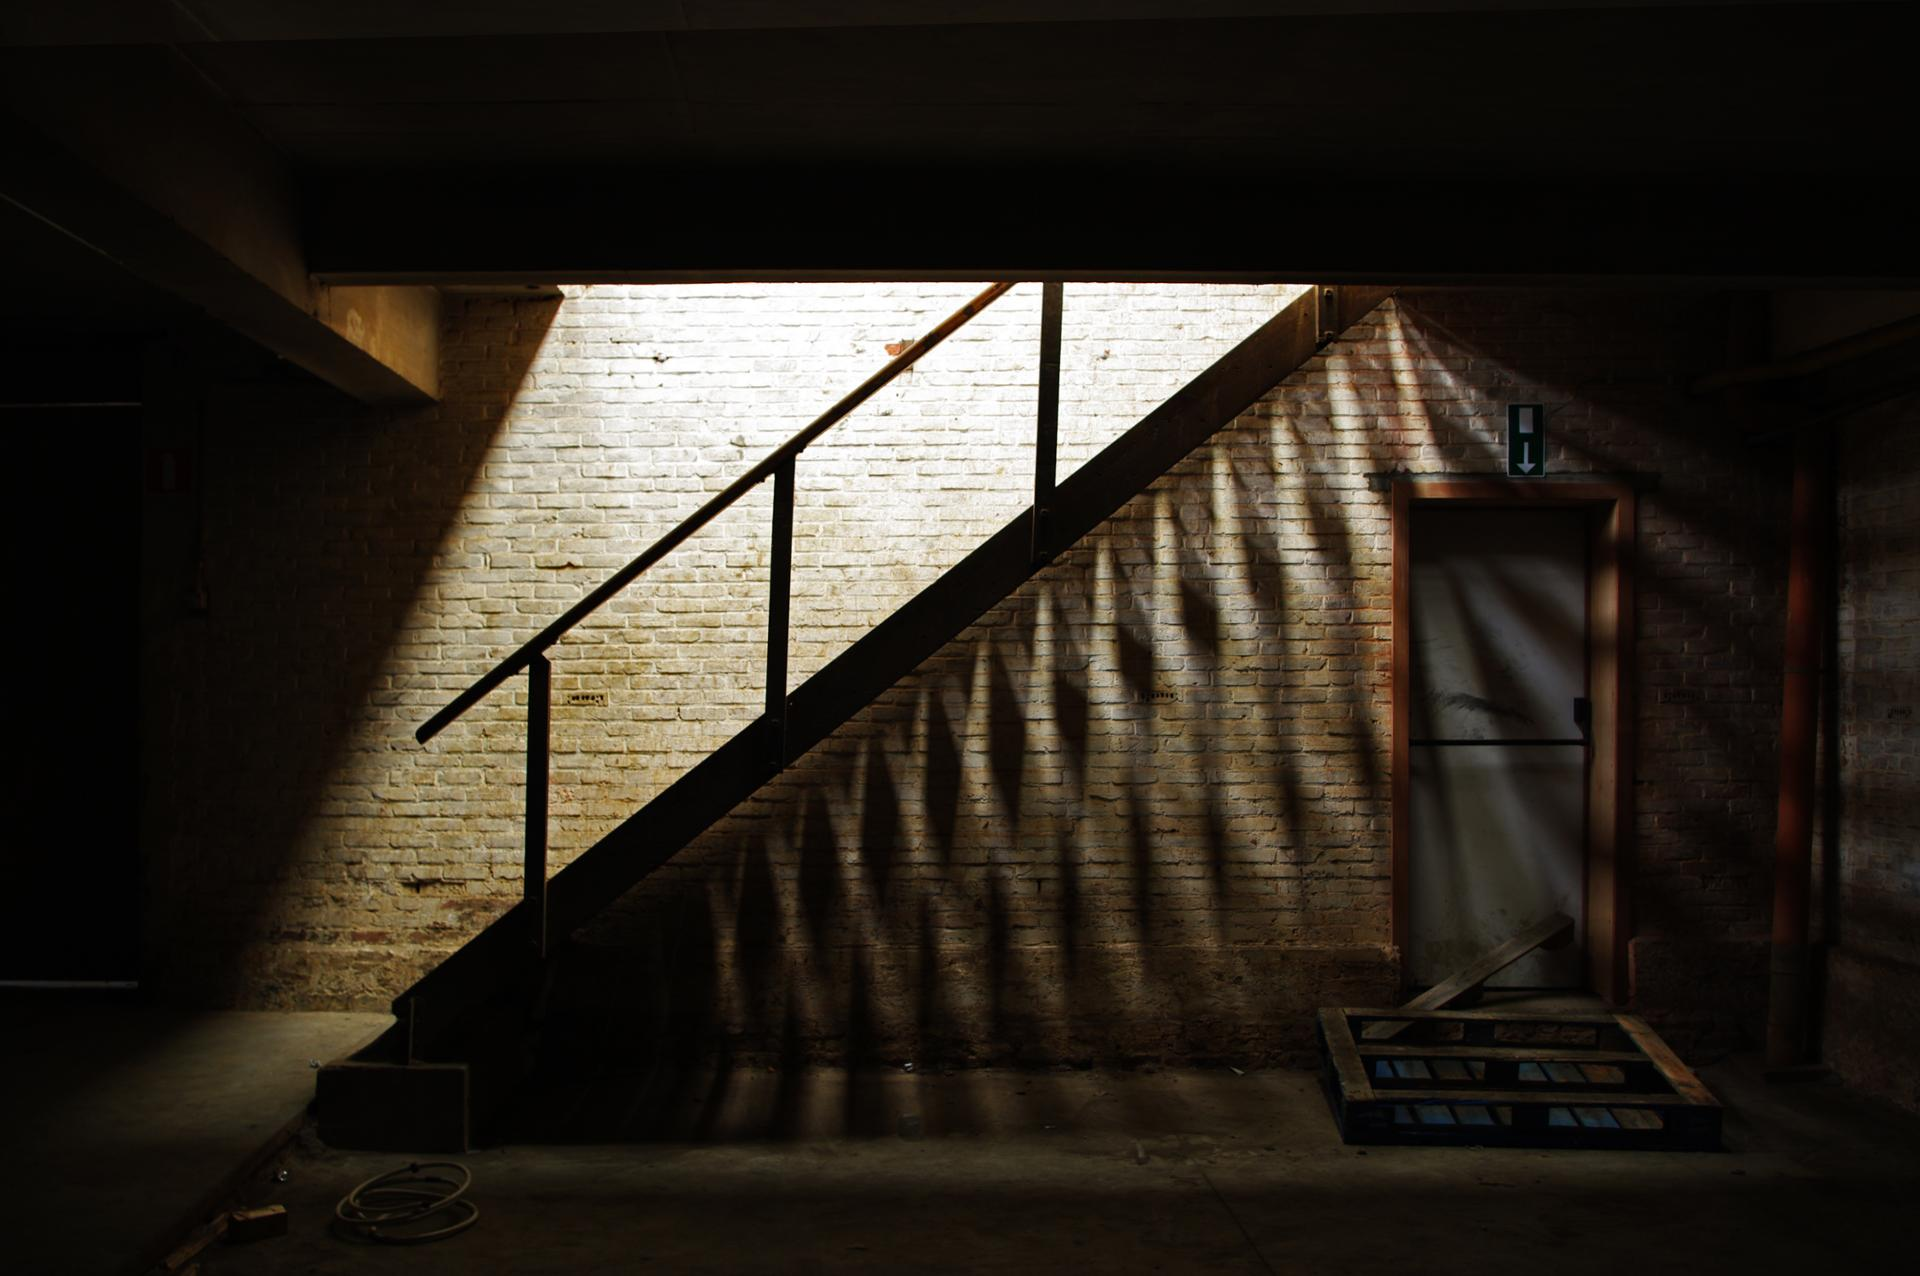 l'ombre de l'escalier